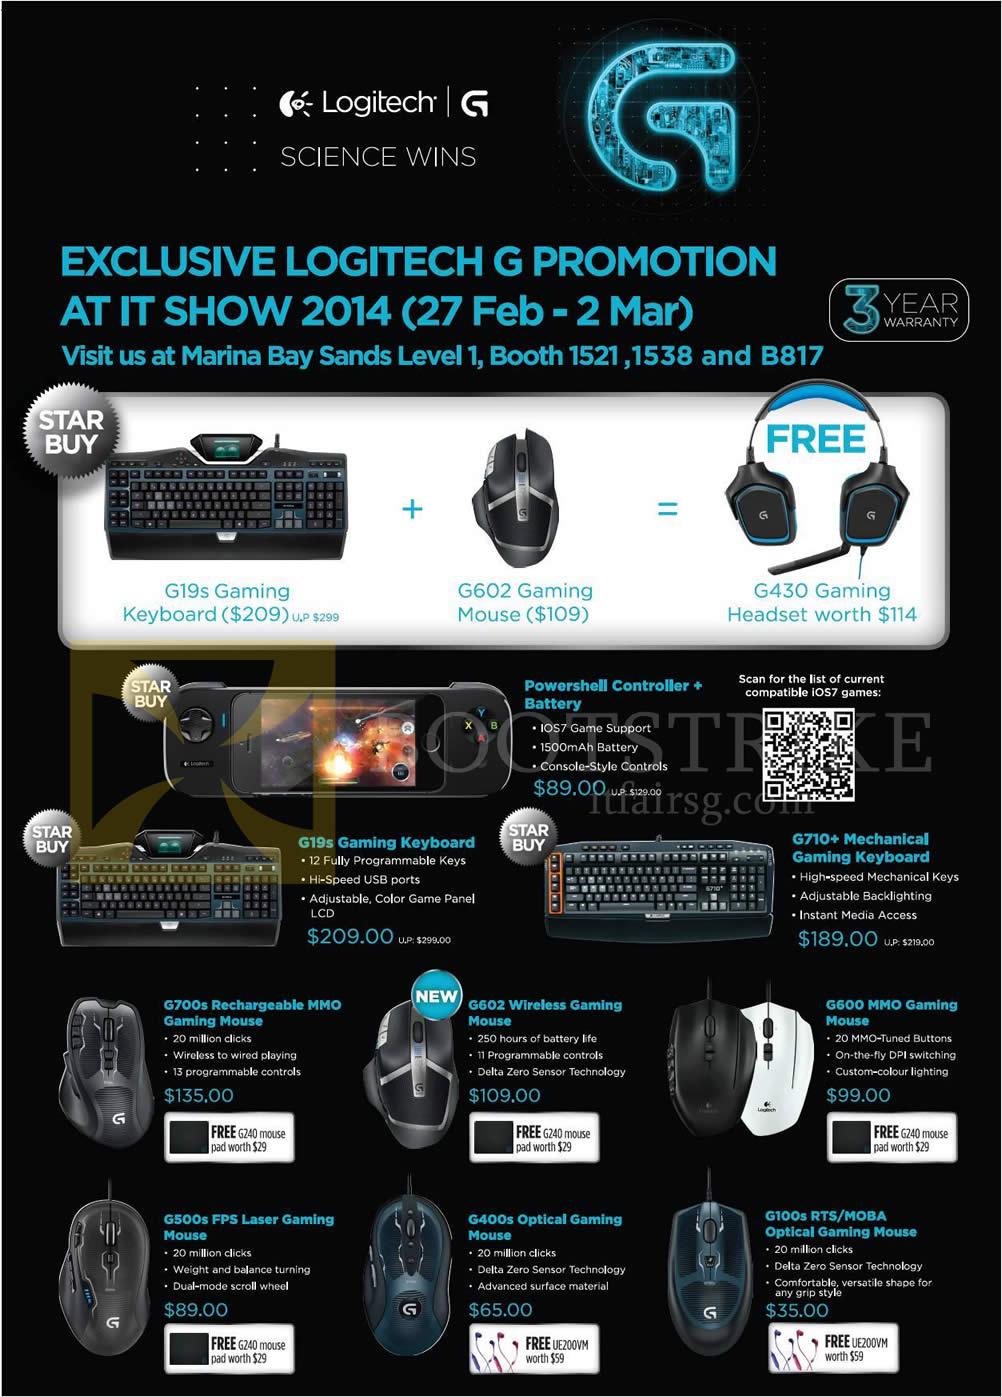 IT SHOW 2014 price list image brochure of Logitech Keyboards Mouse G19s, G602, G430, G710 Plus, G700S, G602, G600, G500S, G400S, G100s